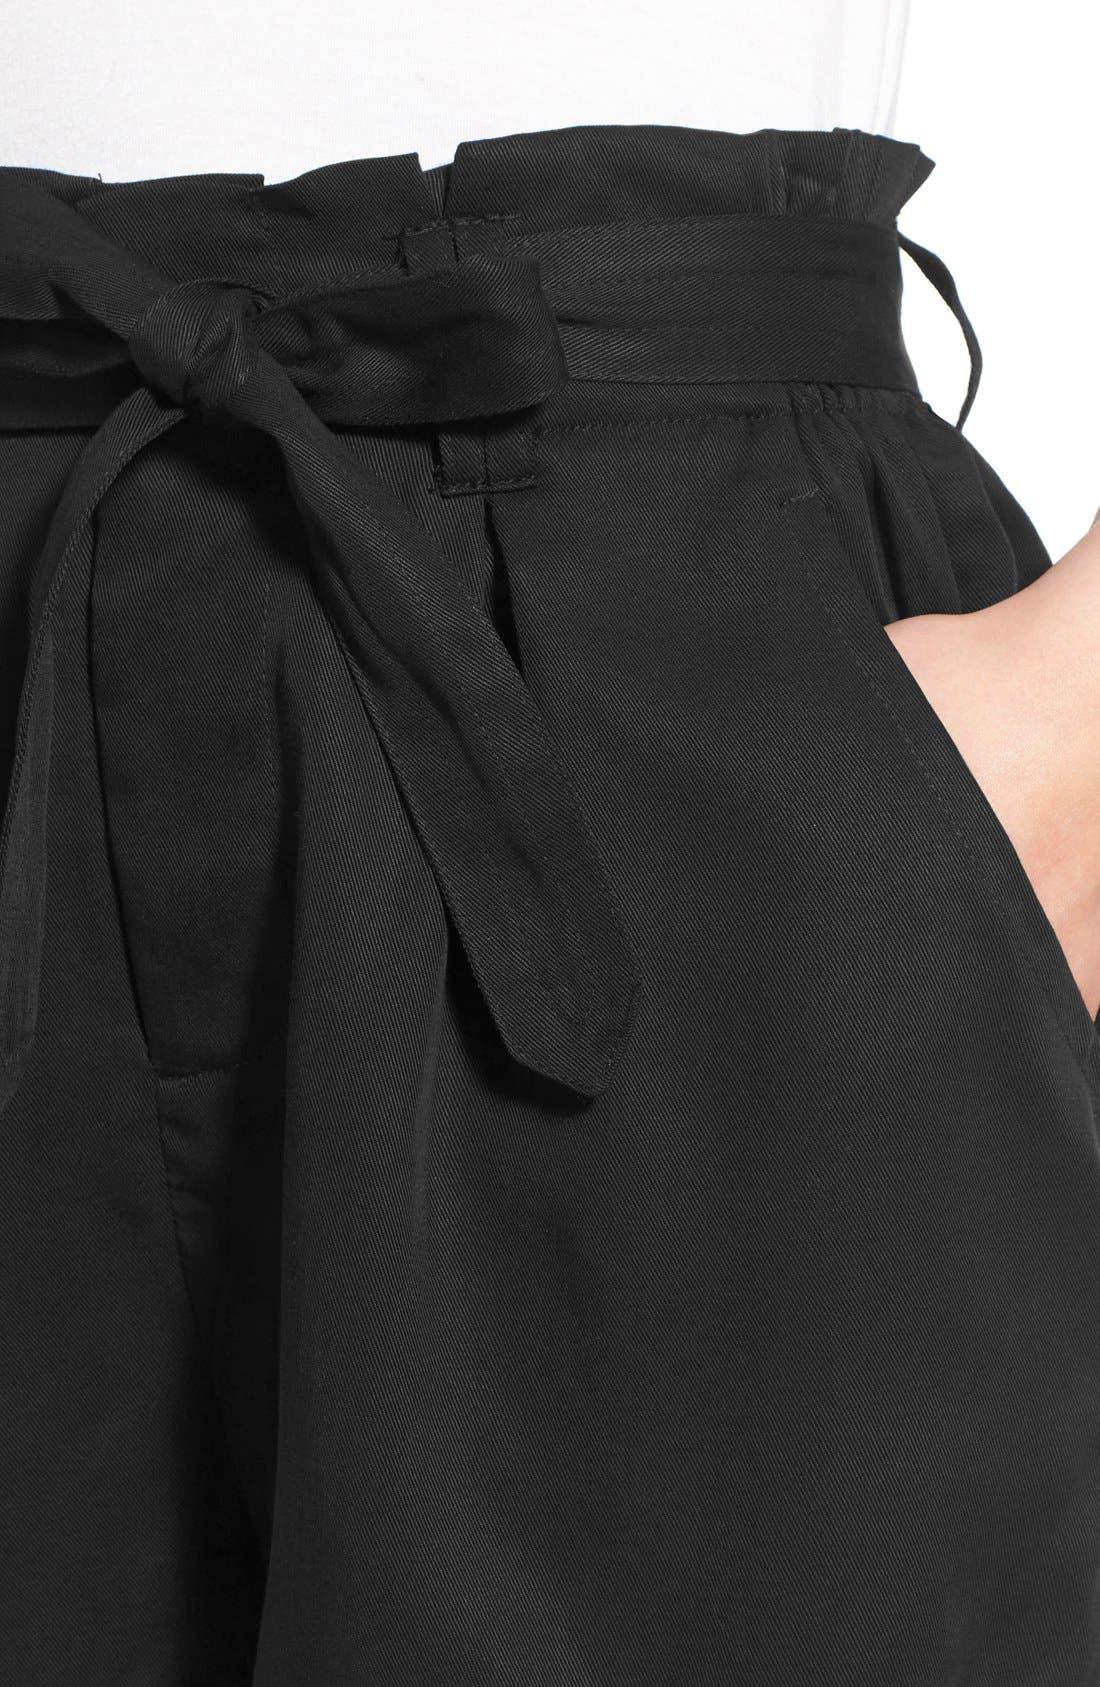 CHLOE & KATIE, Paperbag Shorts, Alternate thumbnail 4, color, 001